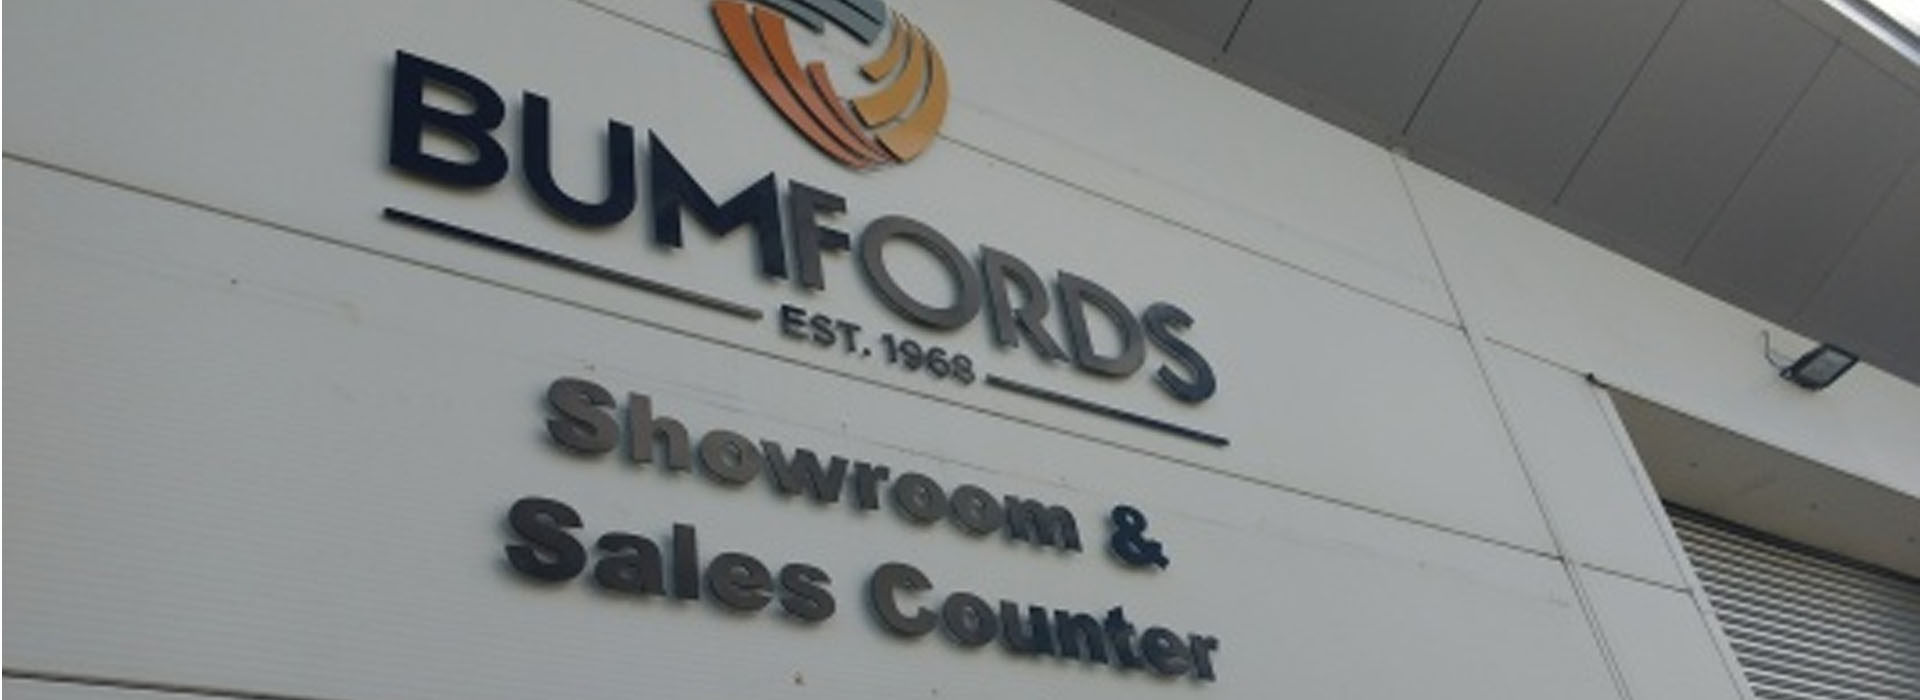 Bumfords